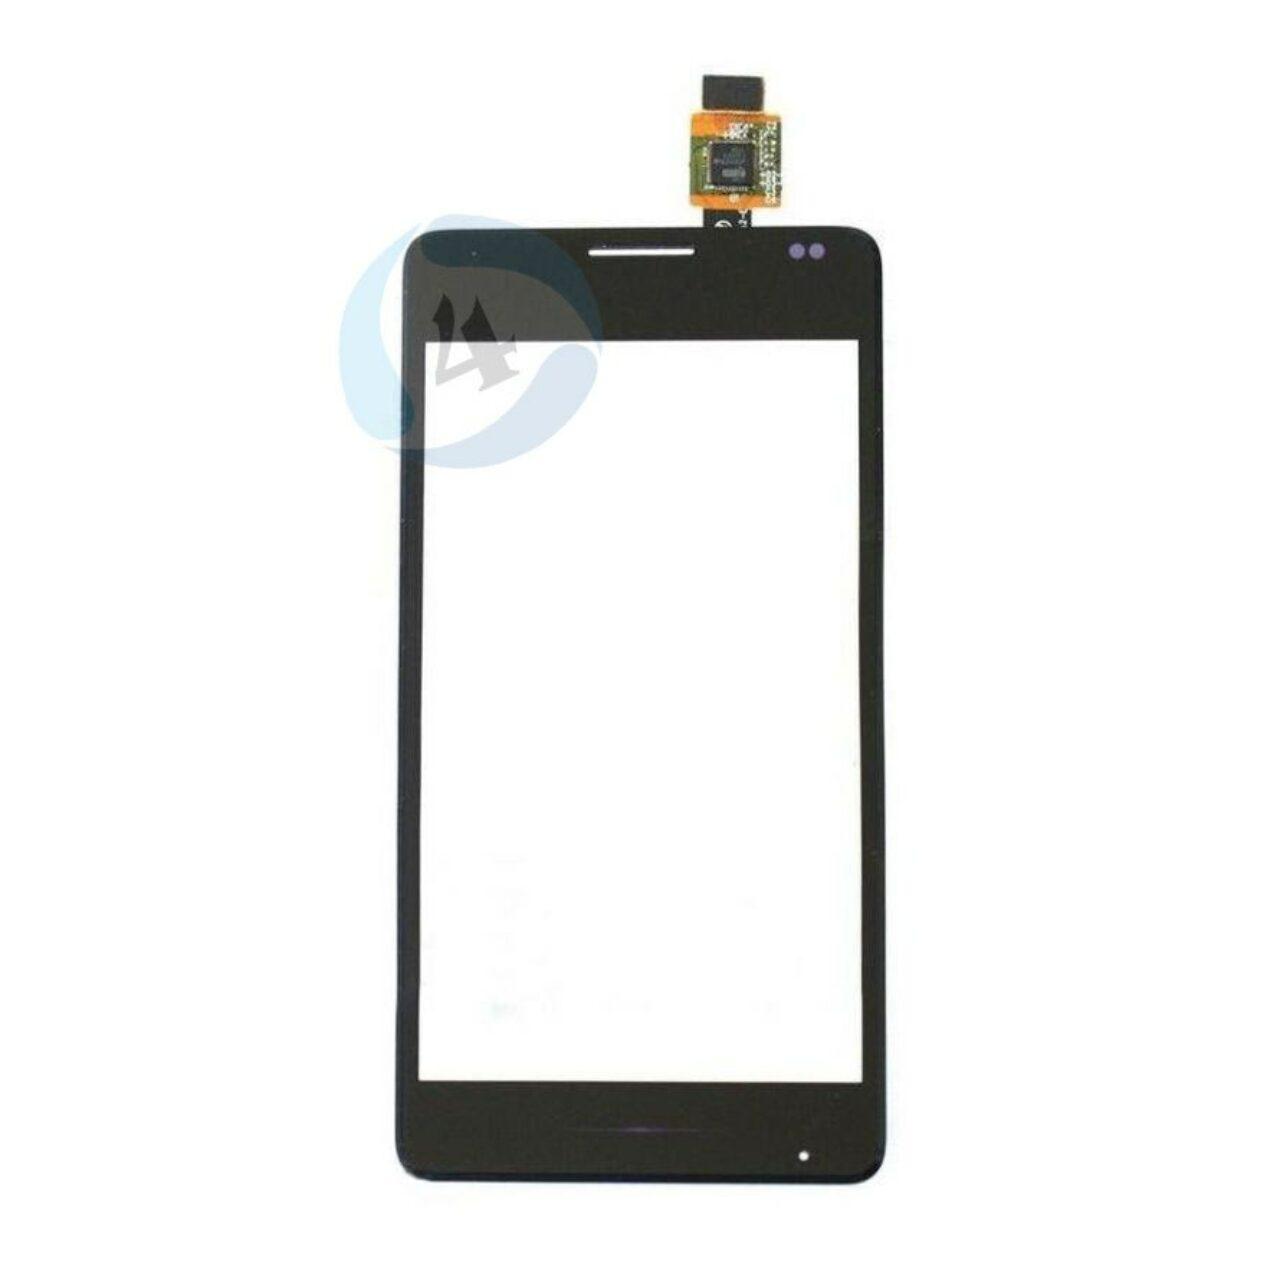 Xiaomi redmi note 9 pro max camera lens 2021 03 11 151116